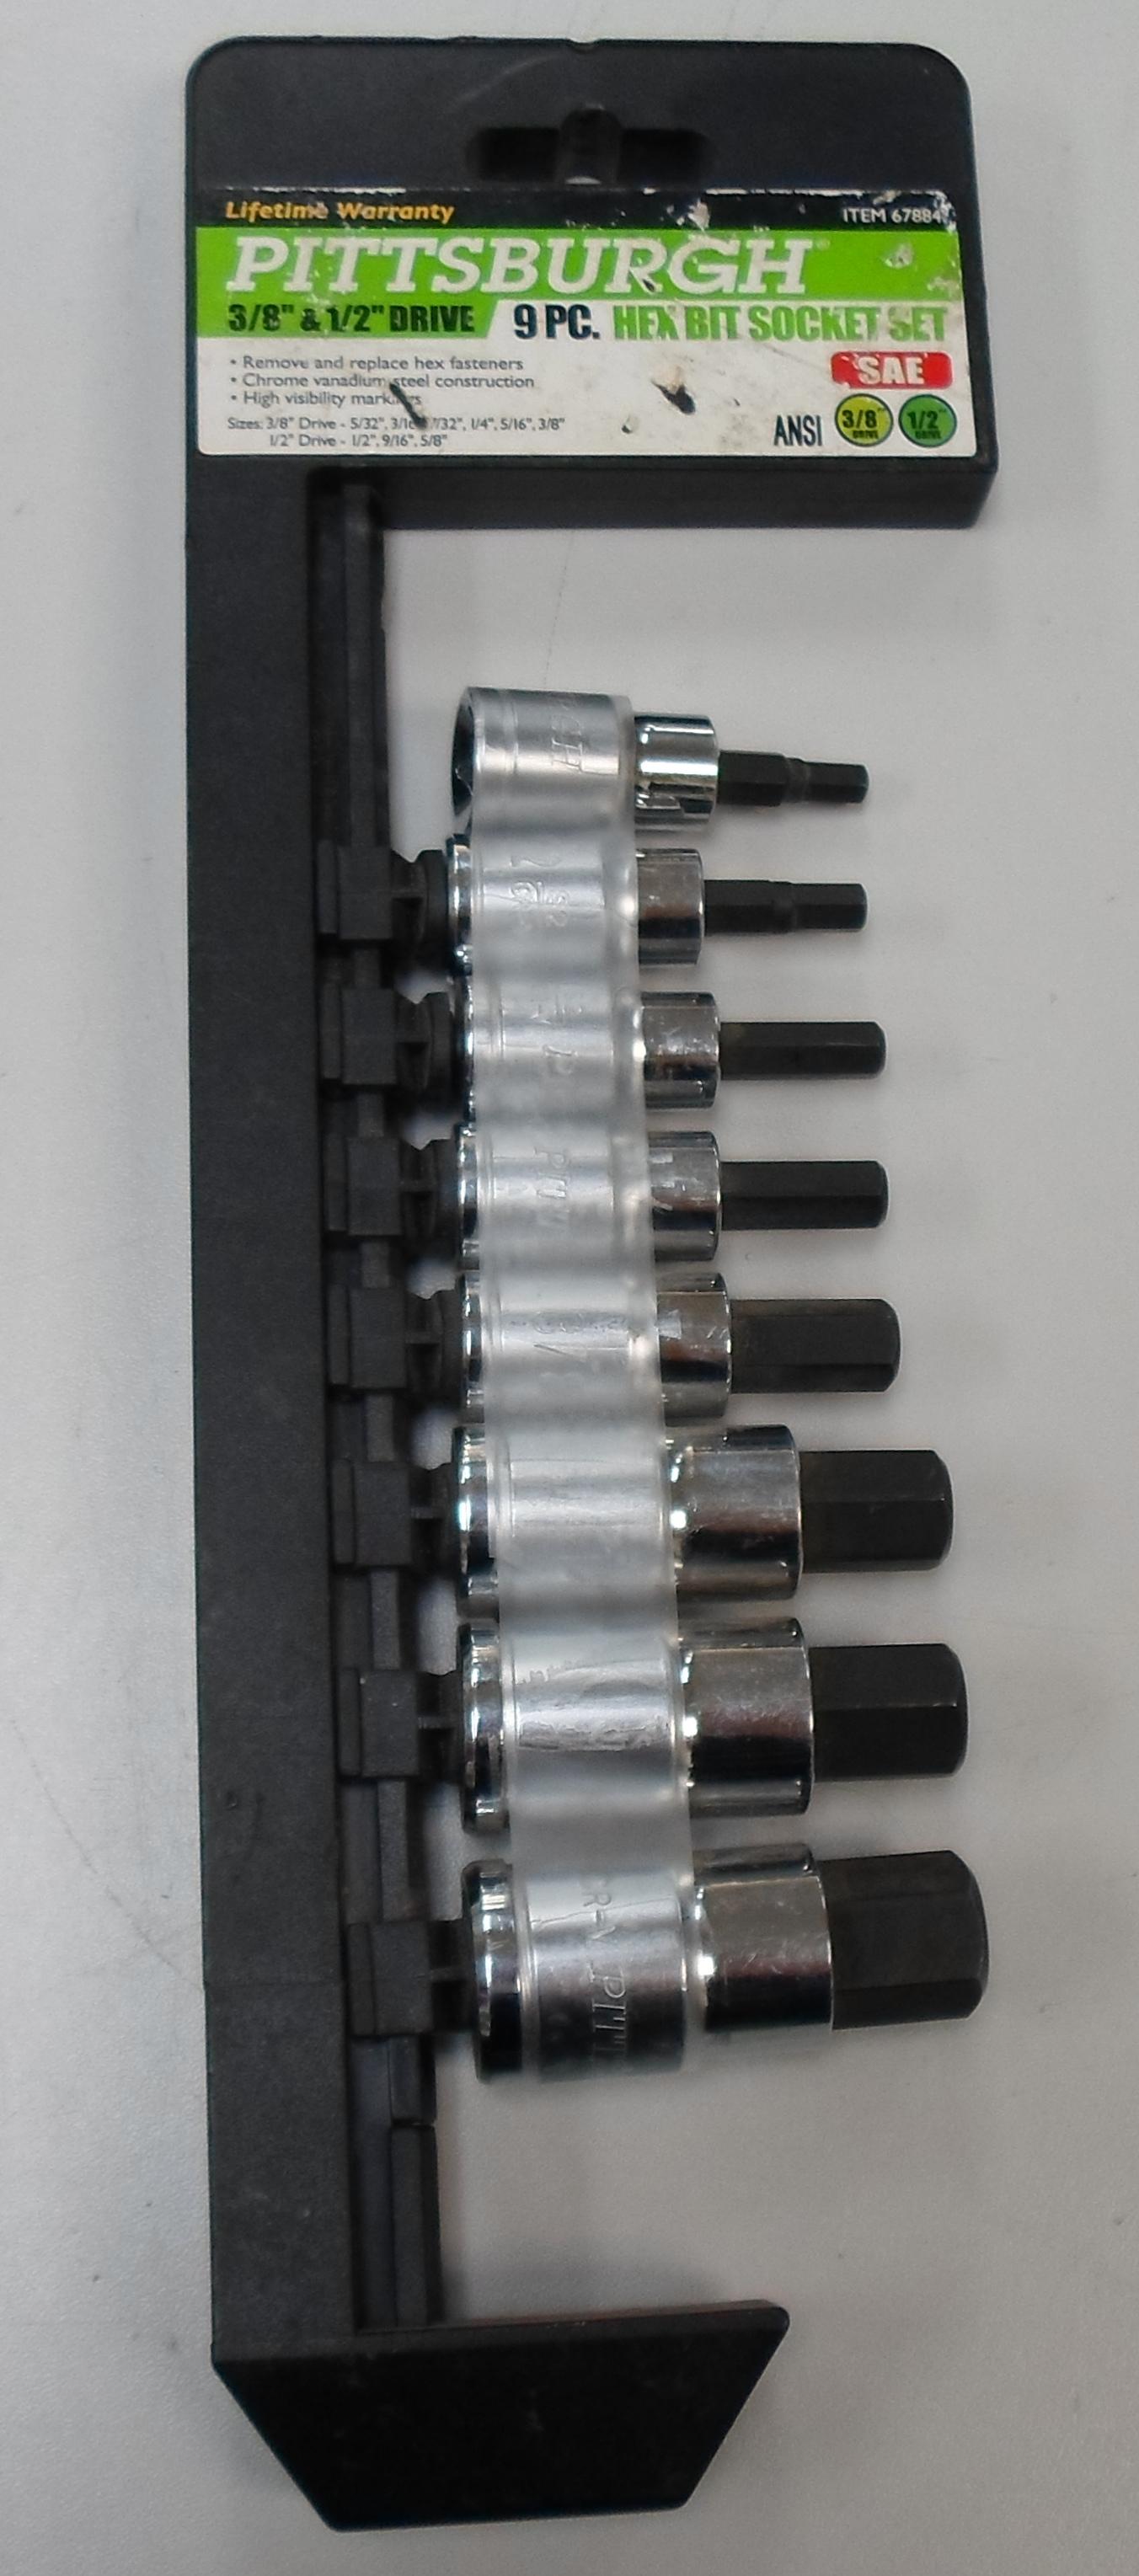 PITTSBURGH - 67884 - HEX BIT SOCKET SET - 9 PC ** MISSING PC ** 3/8